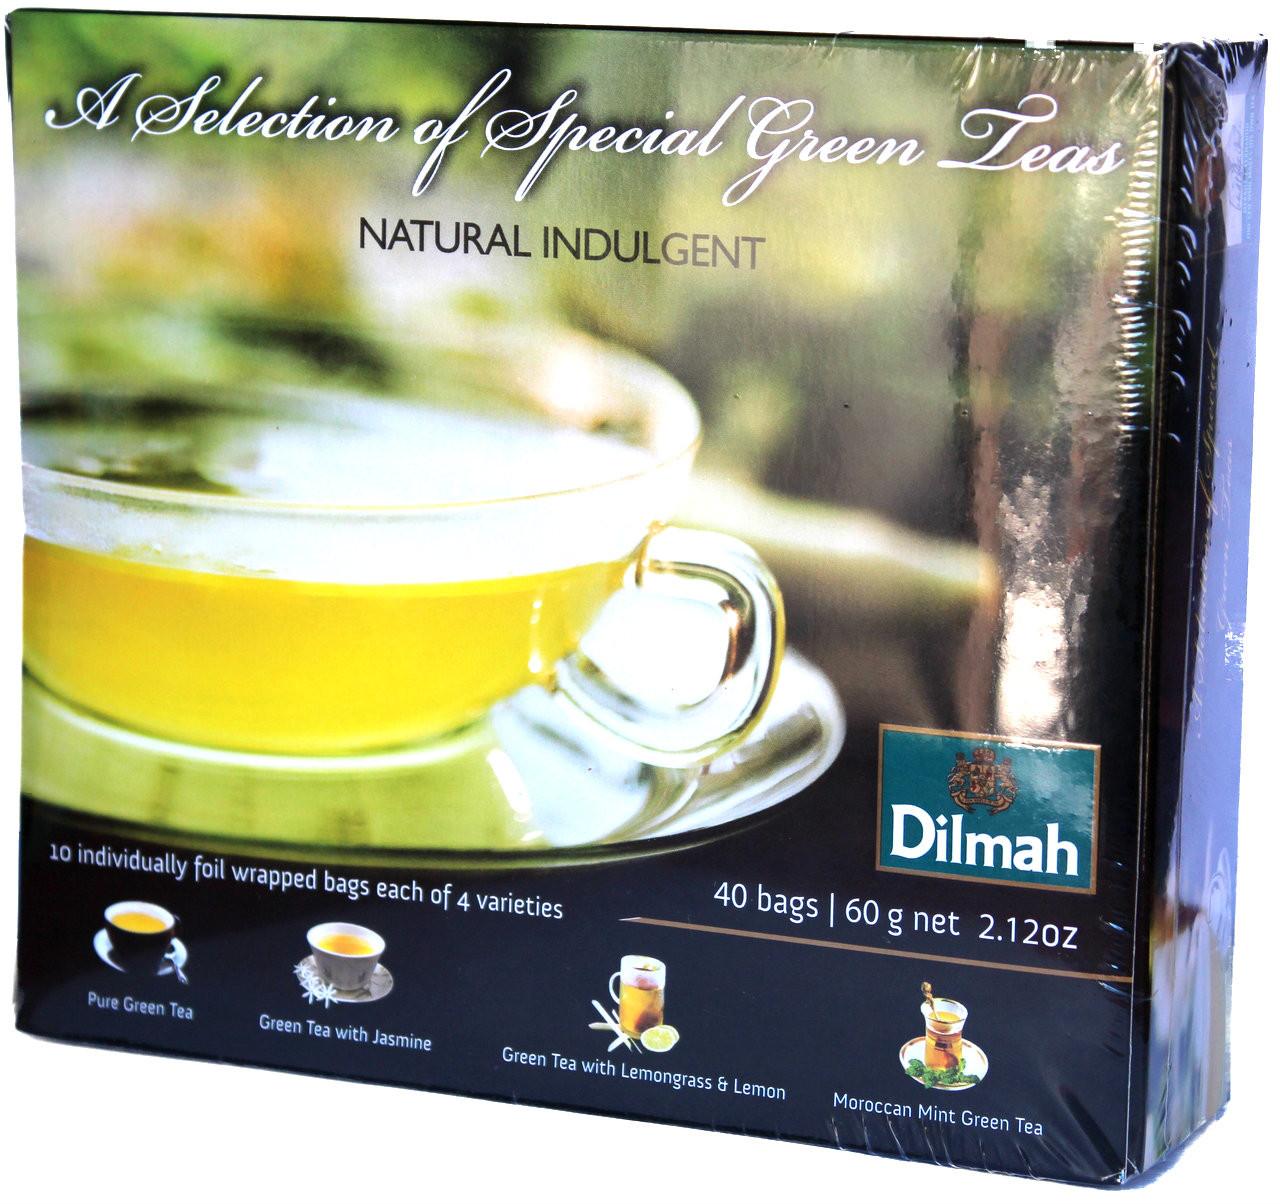 Dilmah a selection of special green teas 40 bags lankandelight image 1 izmirmasajfo